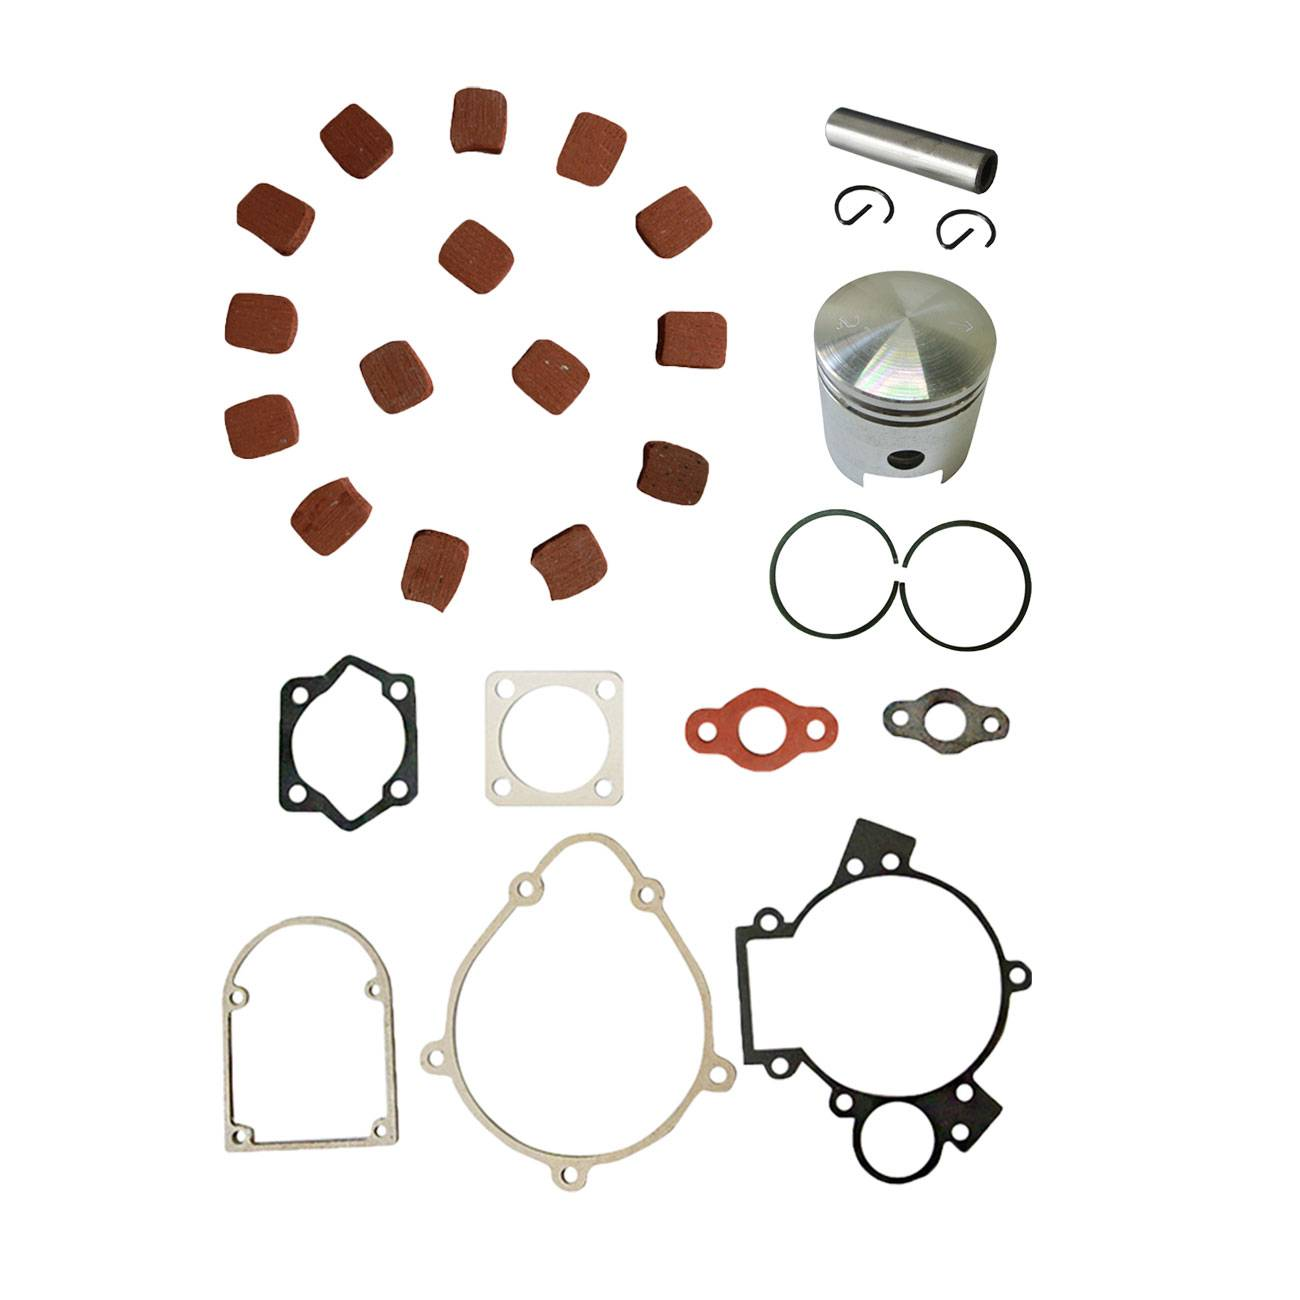 15Pcs Engine Clutch Pads Square Shape For 49cc-80cc Bicycle Motorized